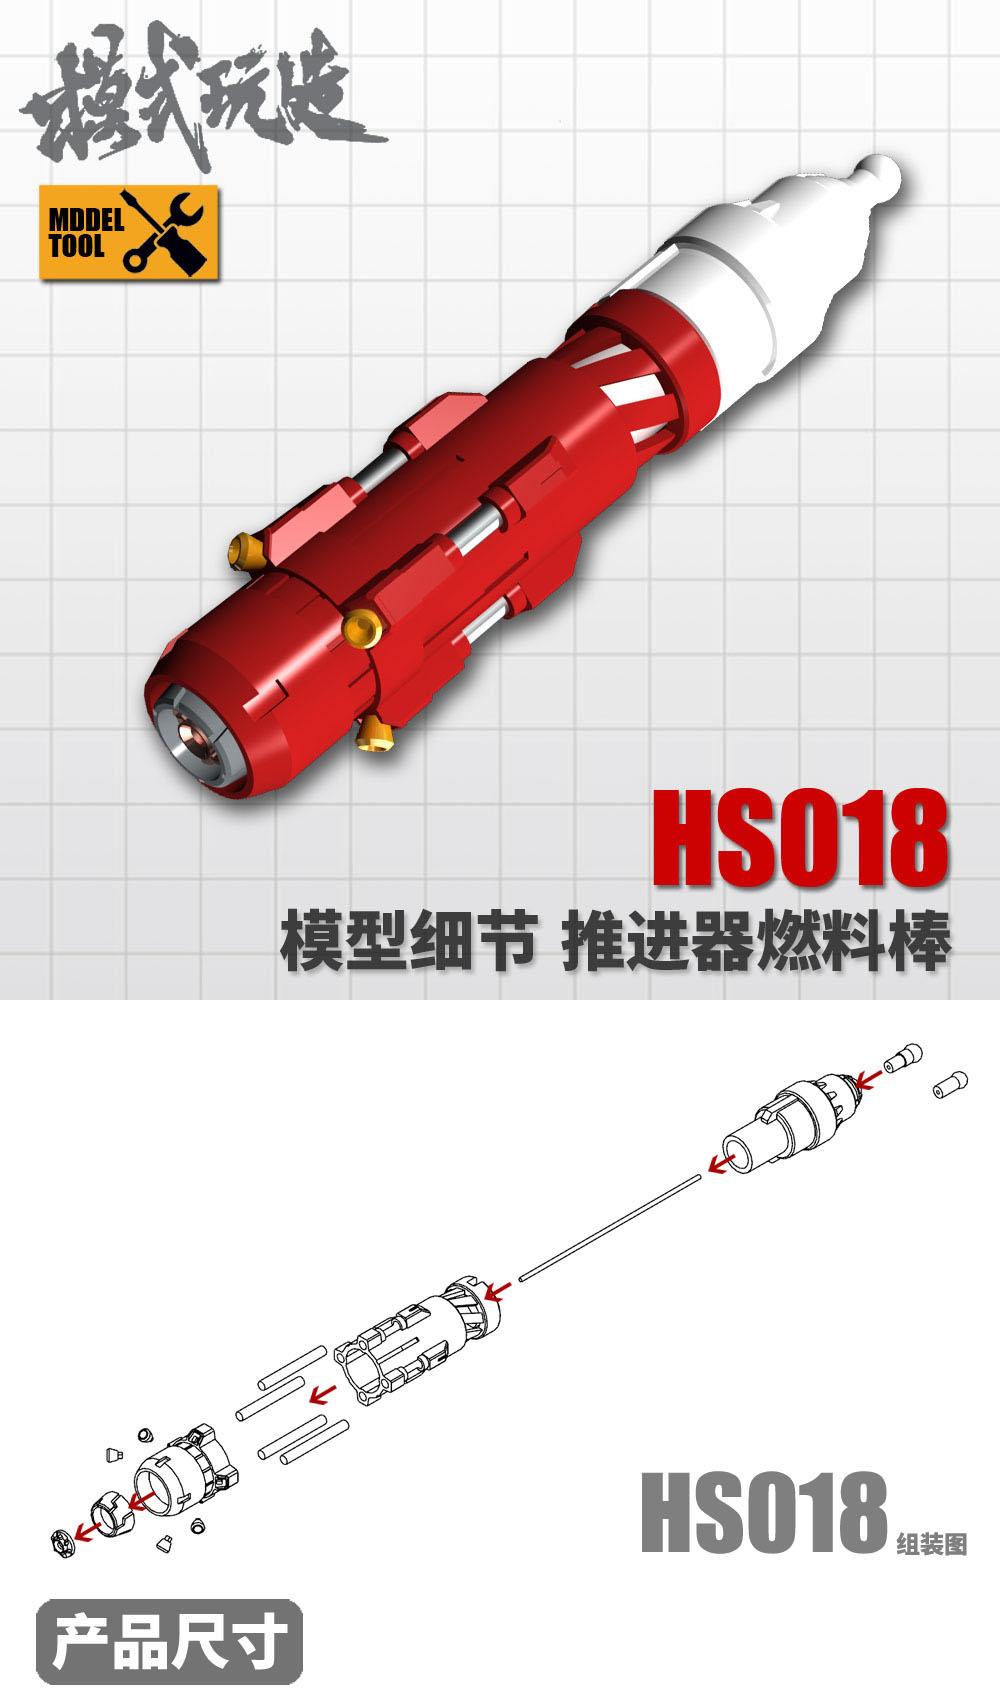 G829_HS018RG_Propeller_tank_003.jpg